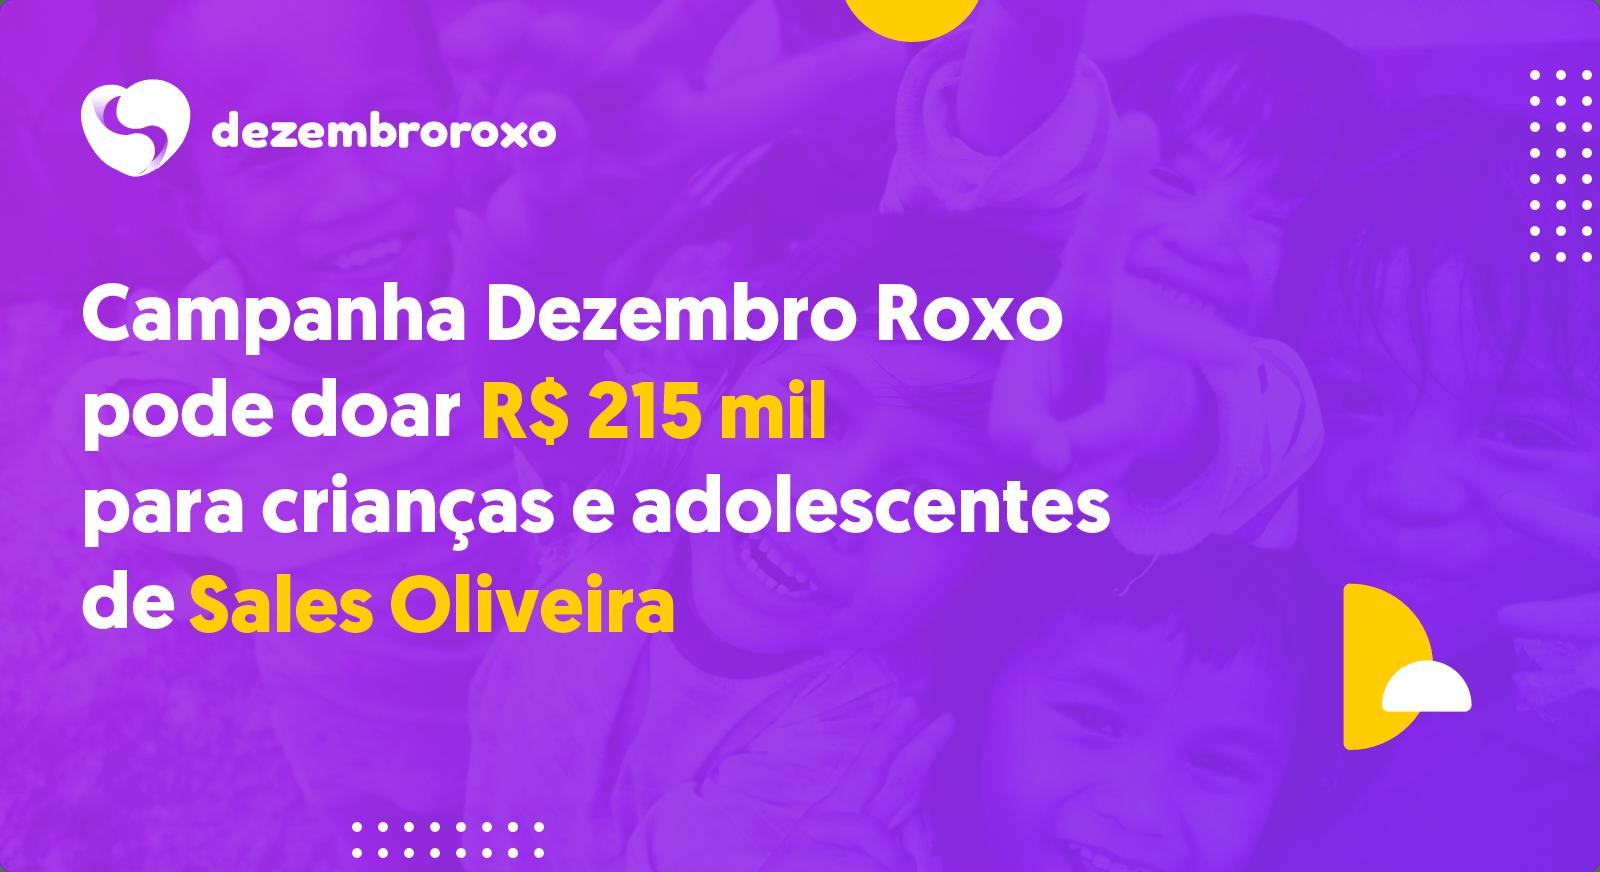 Doações em Sales Oliveira - SP